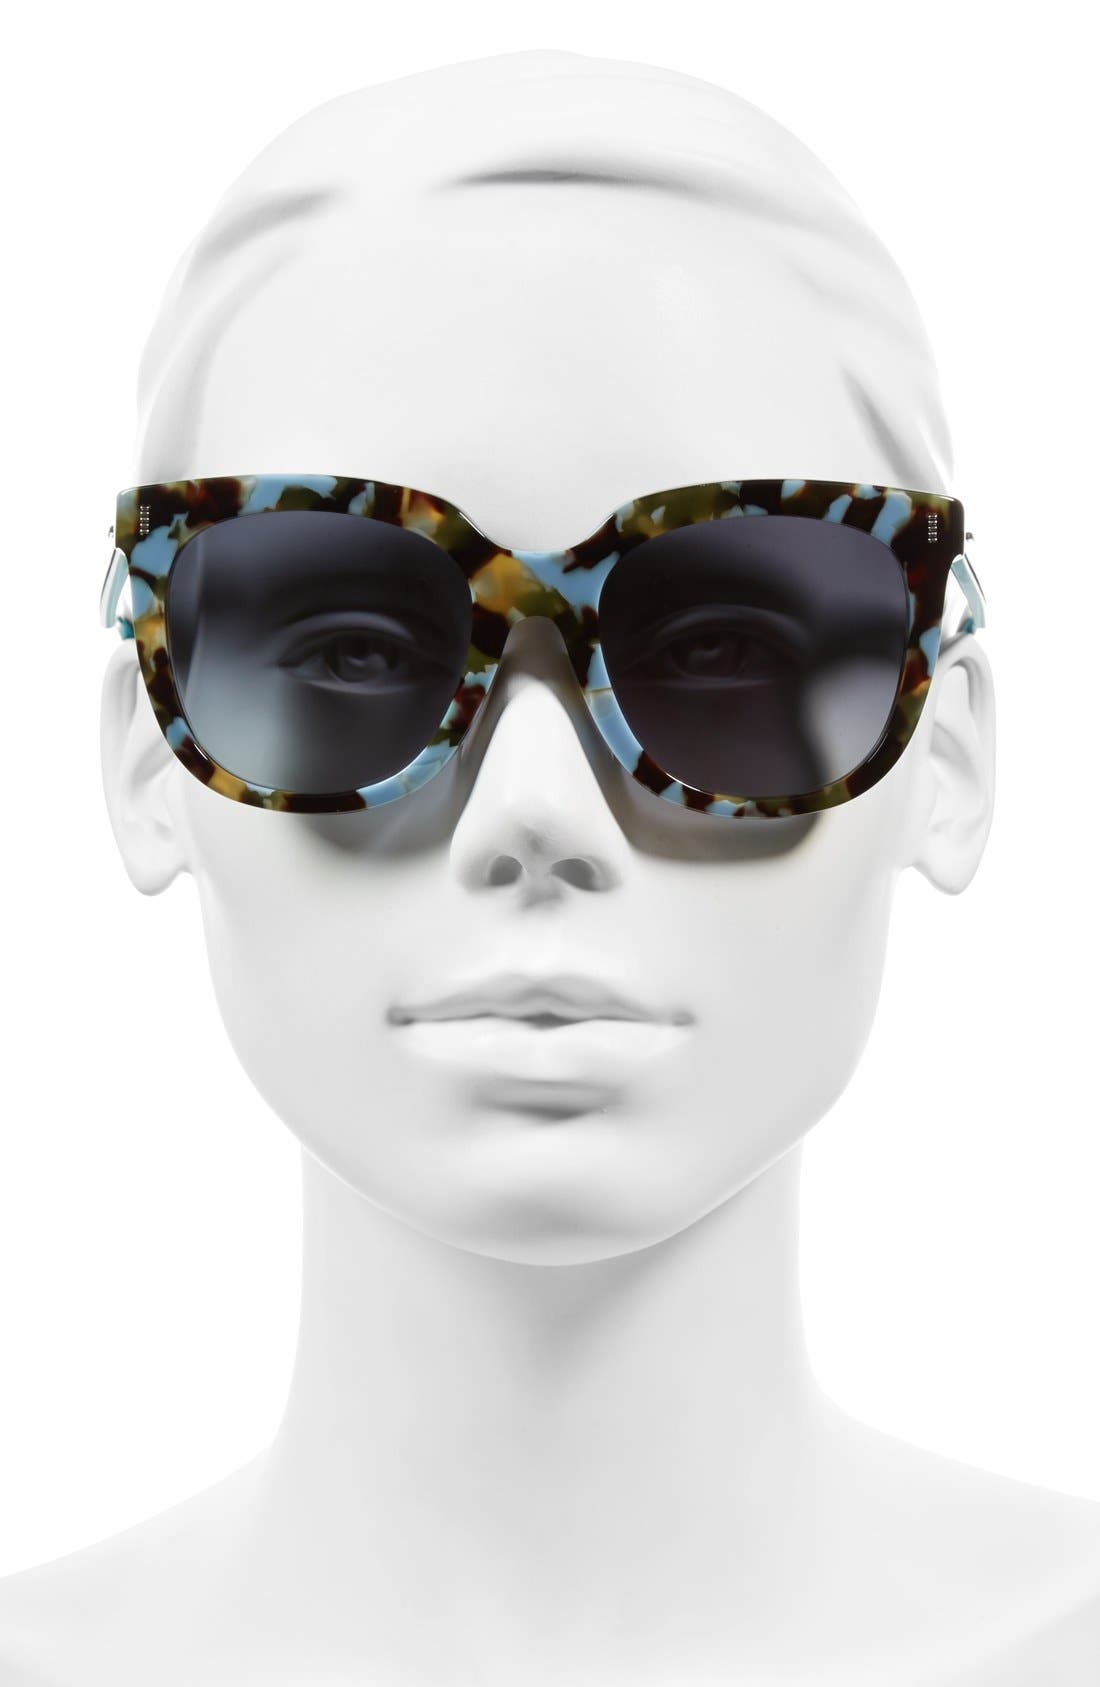 54mm Retro Sunglasses,                             Alternate thumbnail 2, color,